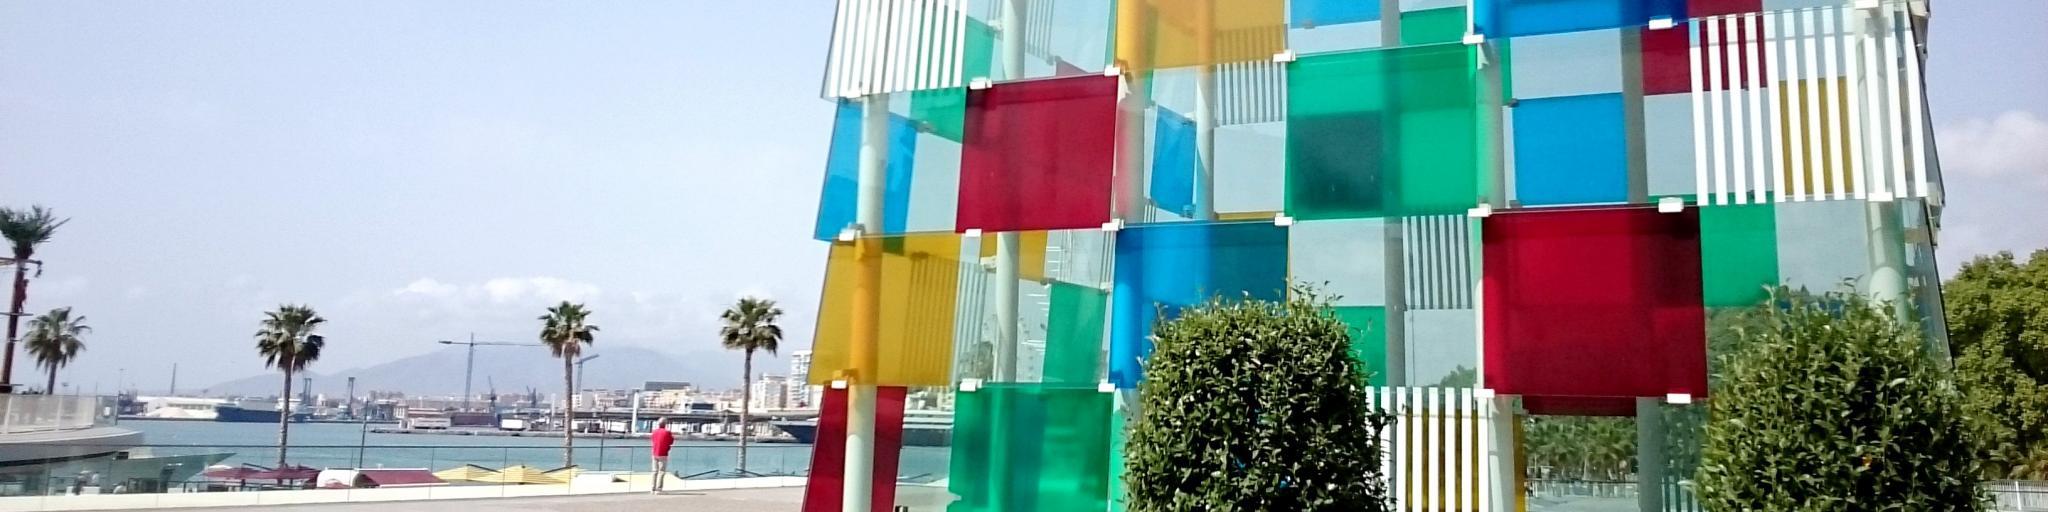 Centre Pompidou, Malaga, Spain